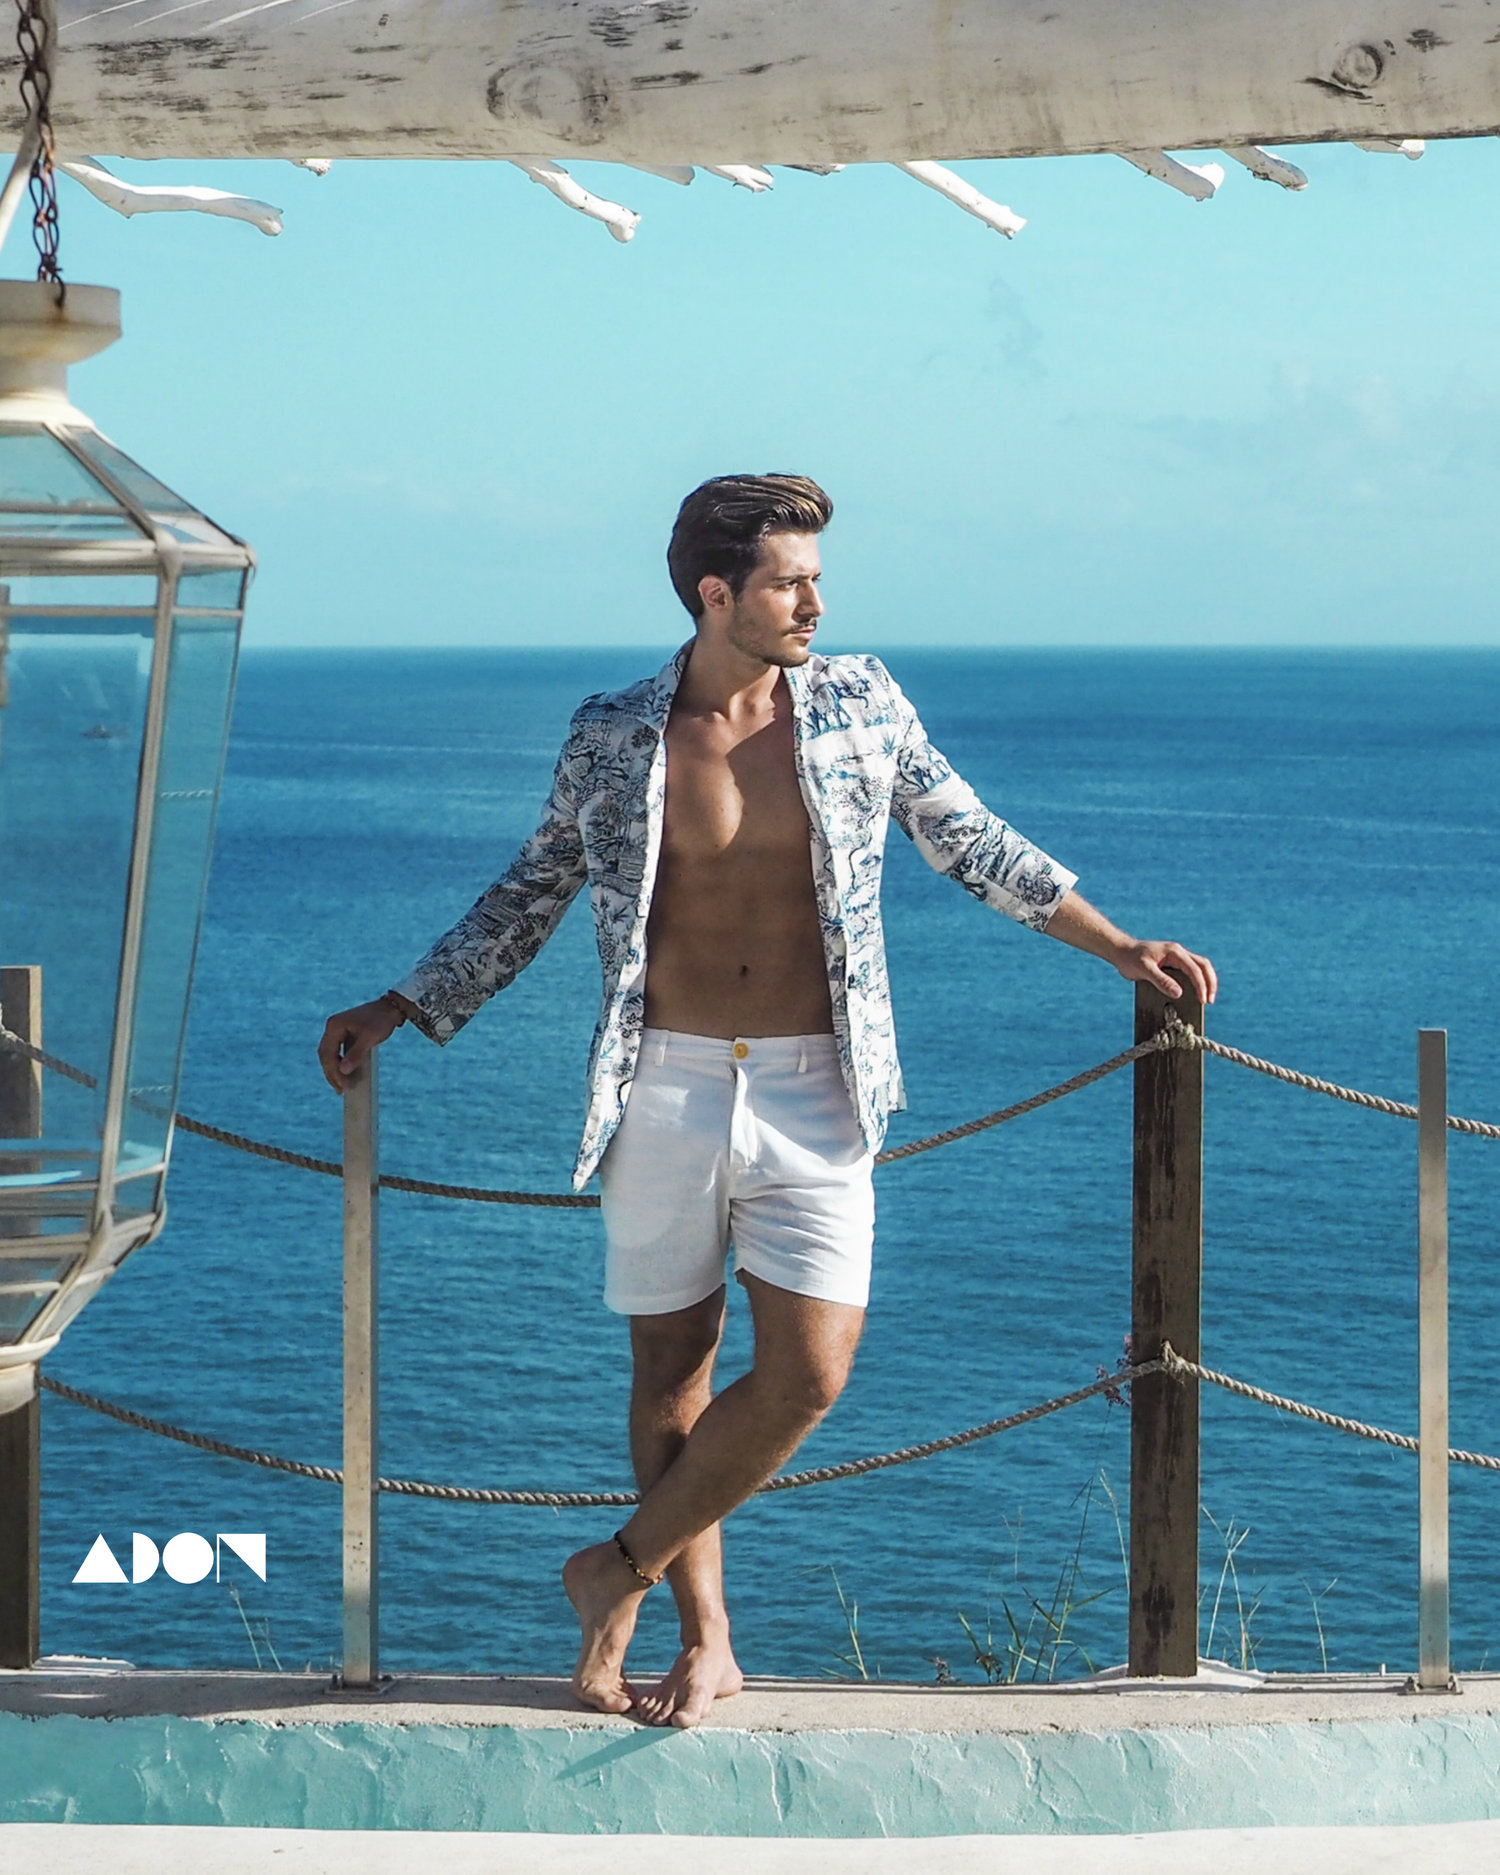 Adon Exclusive: Model Rinor By Alex Akimov